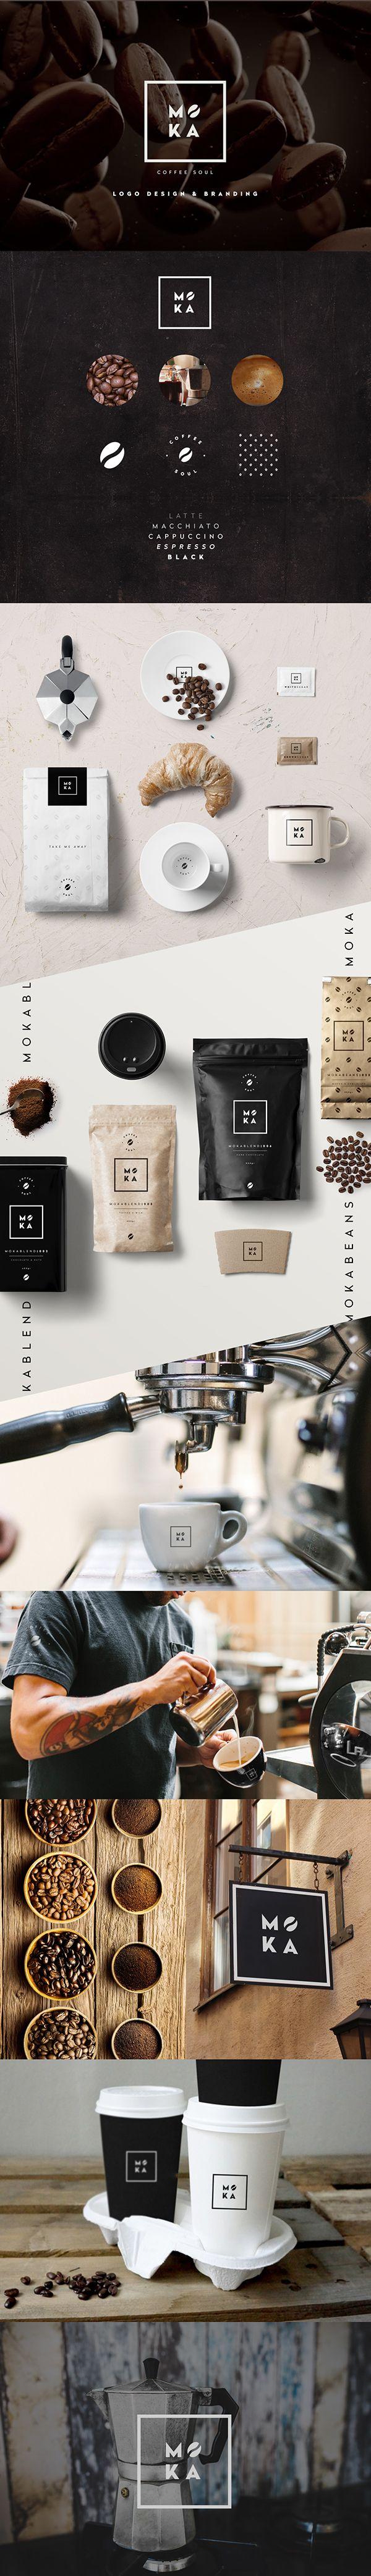 https://www.behance.net/gallery/35033345/Moka? #moka #coffee #coffeeshop #branding #logo #coffeelogo #coffeebean #coffeesoul #italiancoffee #pattern #design #graphicdesign